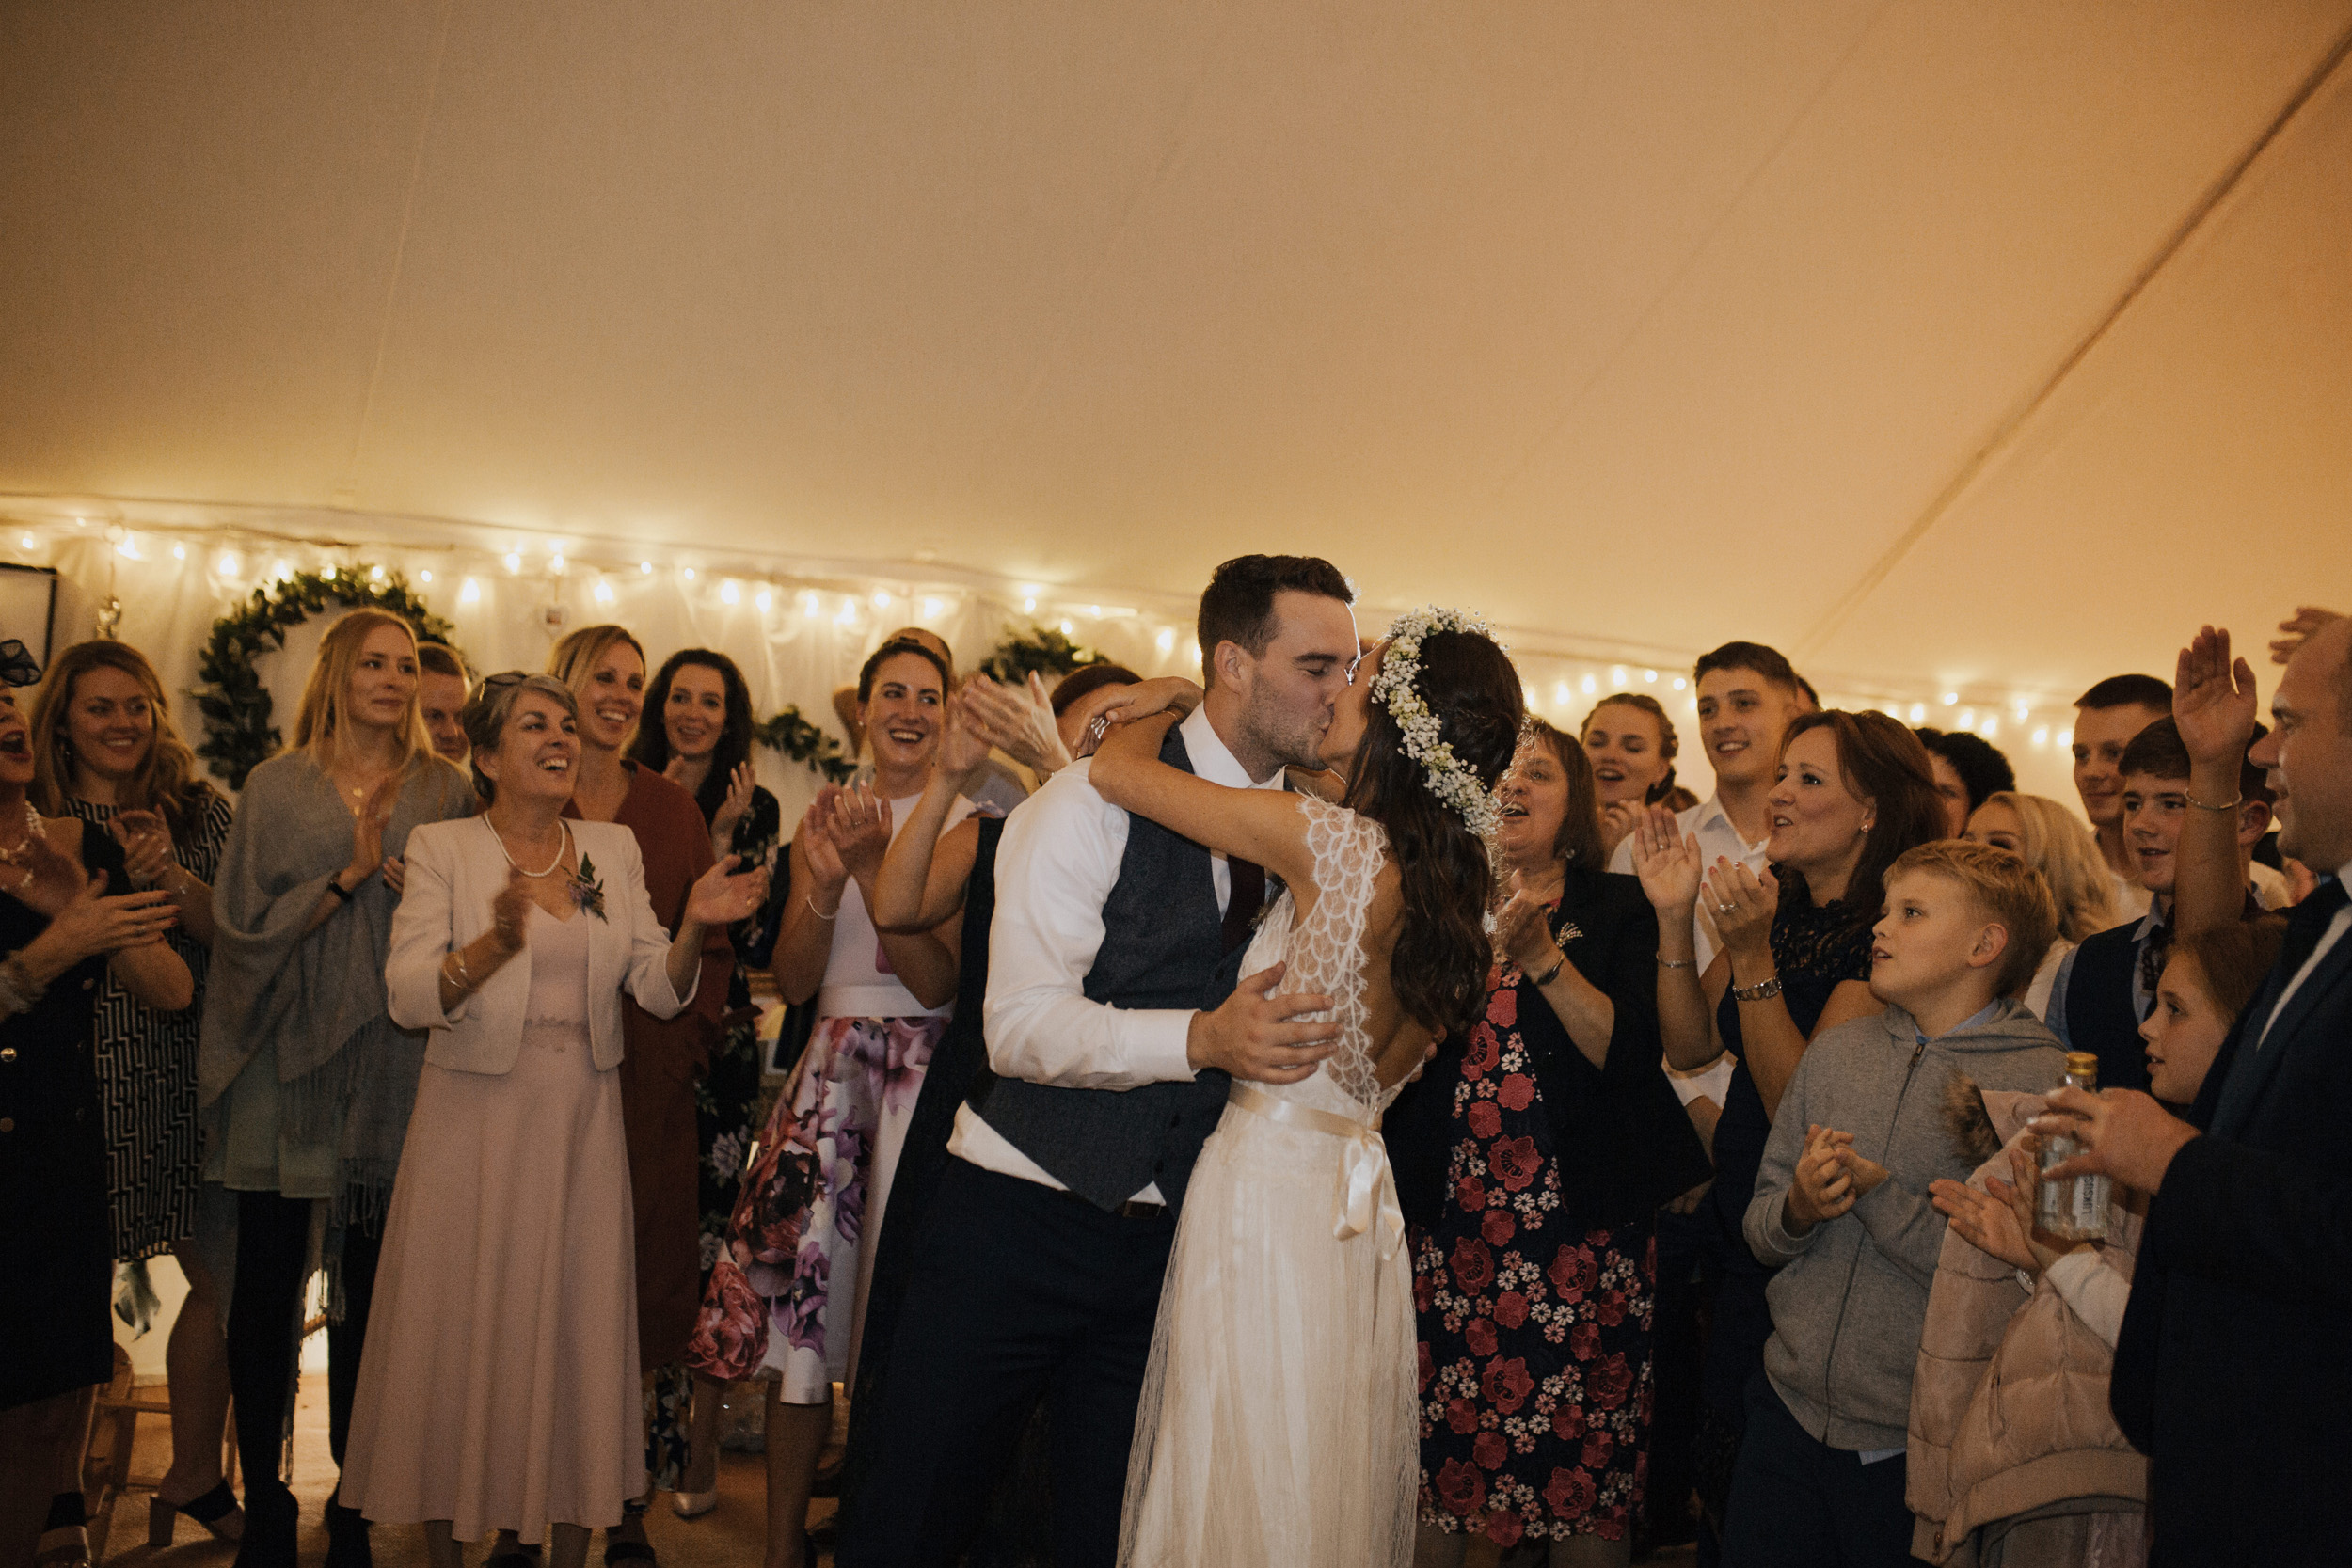 Joasia-Kate-Beaumont-Bohemian-Lace-Wedding-Dress-Peak-District-Sheffield-Wedding-59.jpg